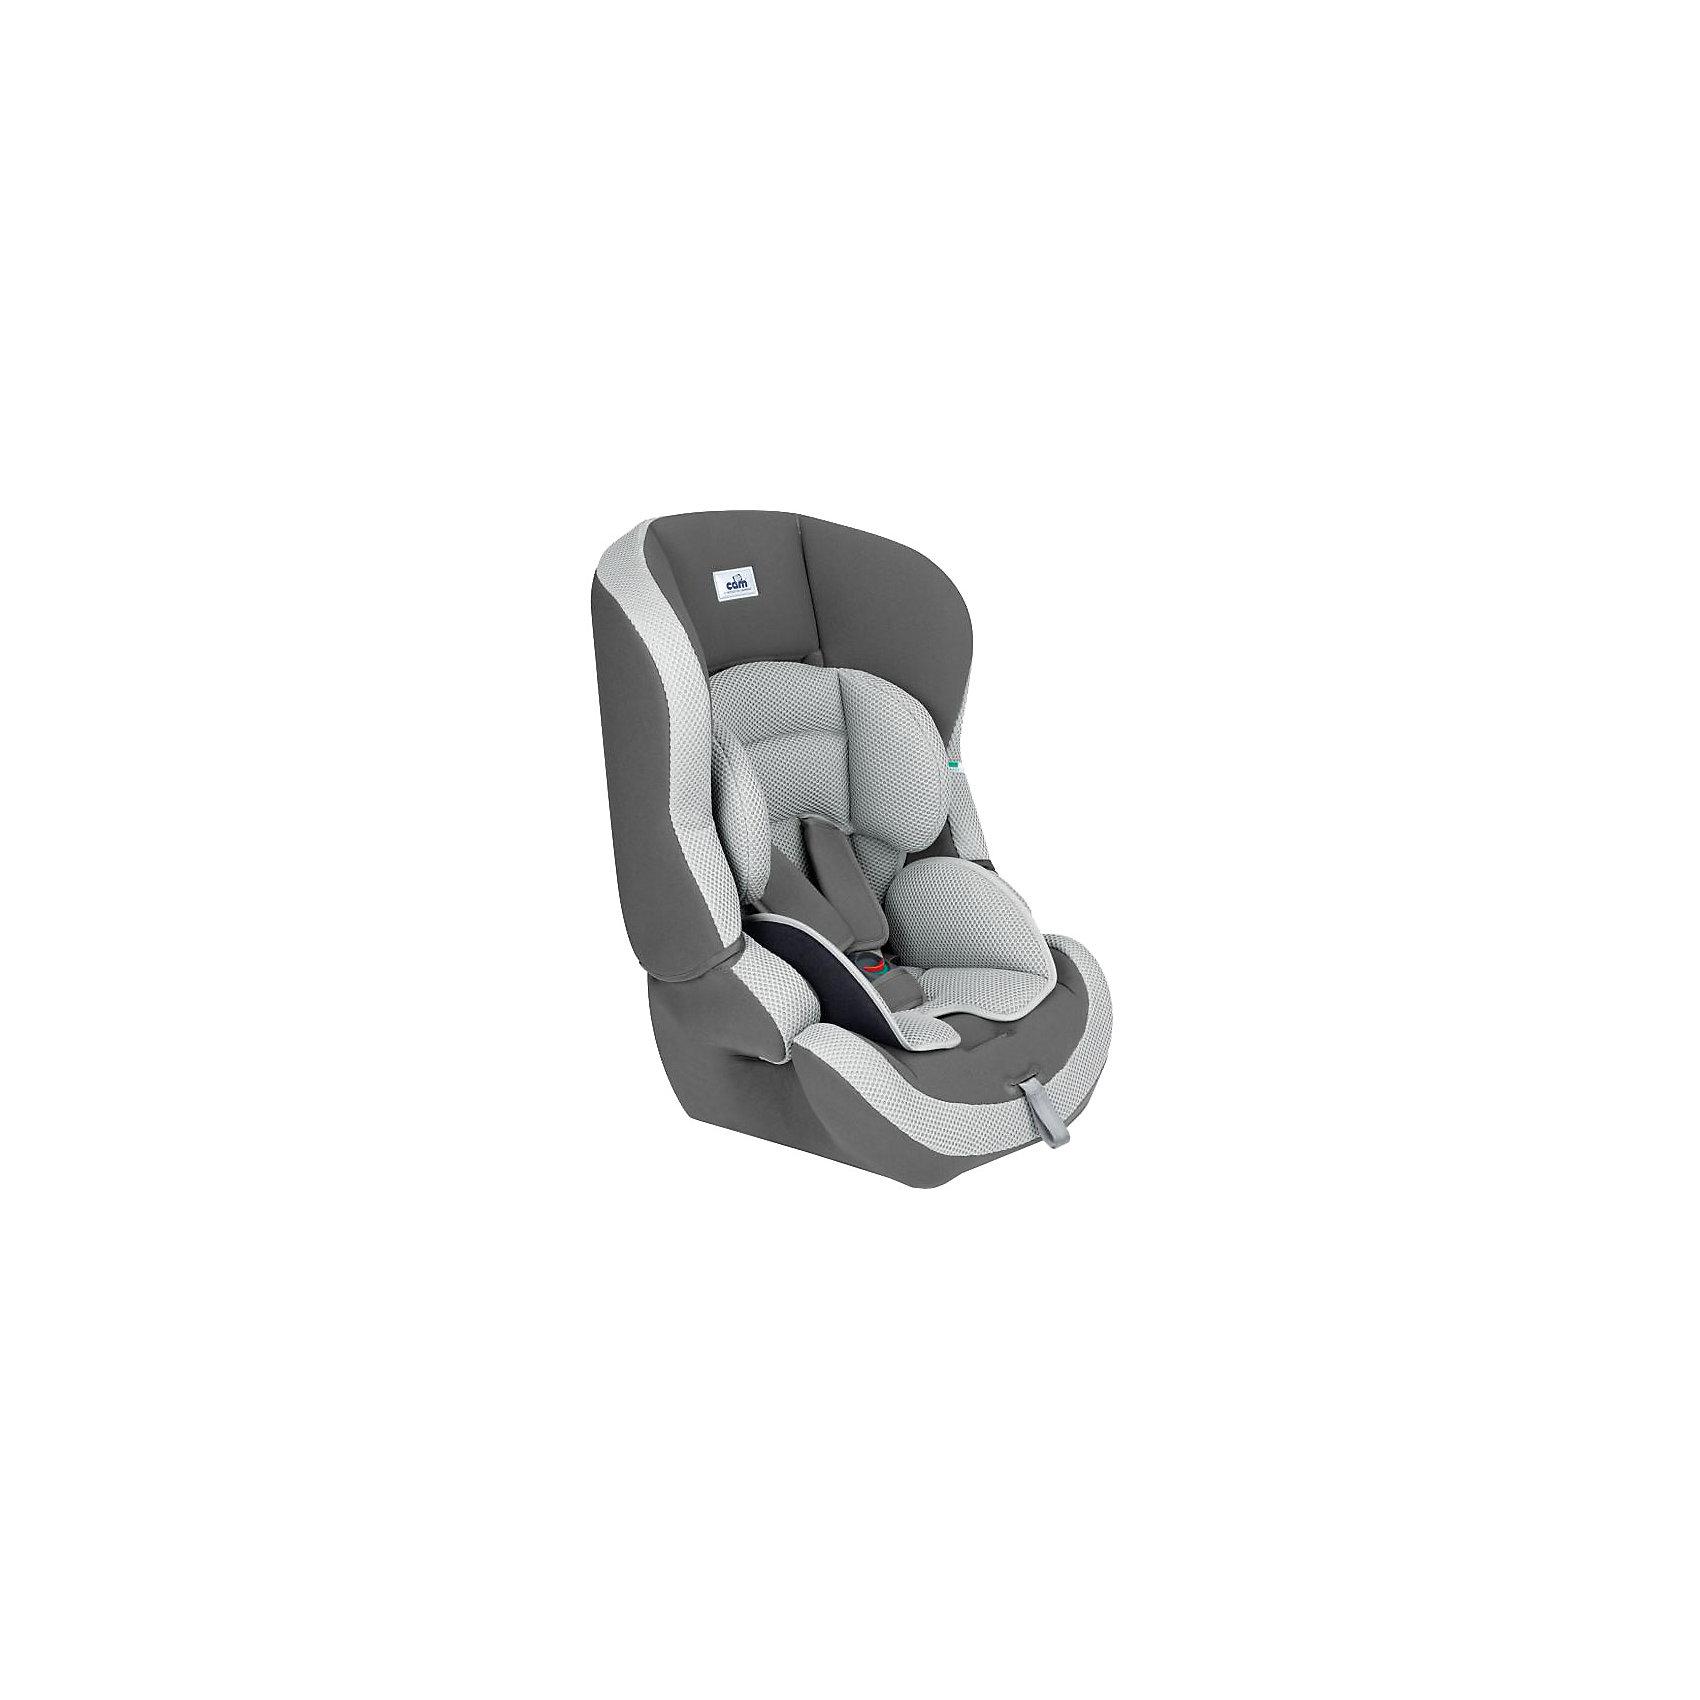 Автокресло CAM Travel Evolution, 9-36 кг, серый